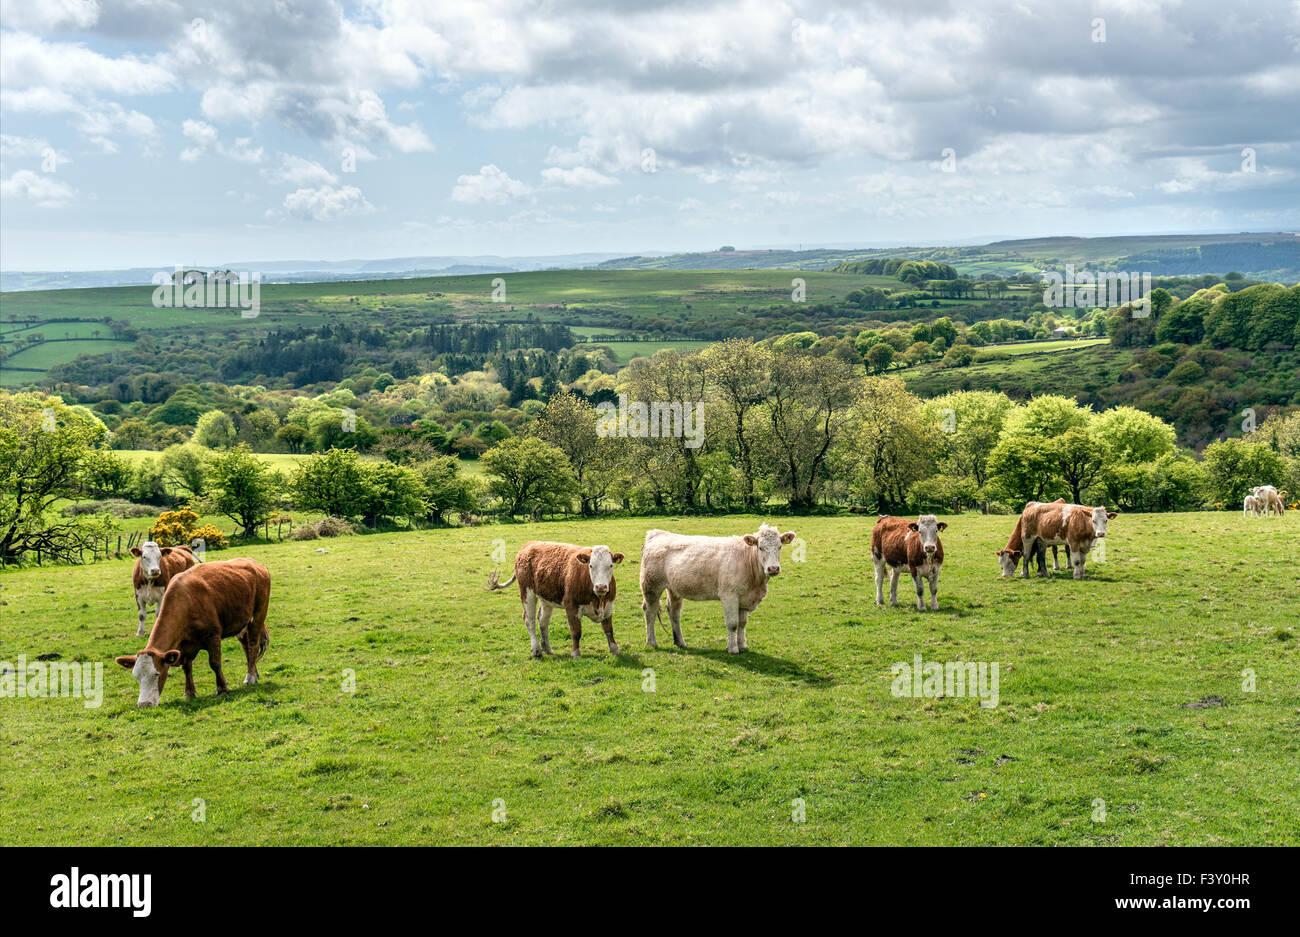 Cattle in a landscape at the Dartmoor National Park, Devon, England, UK | Kuehe in Landschaft im Dartmoor Nationalpark, - Stock Image